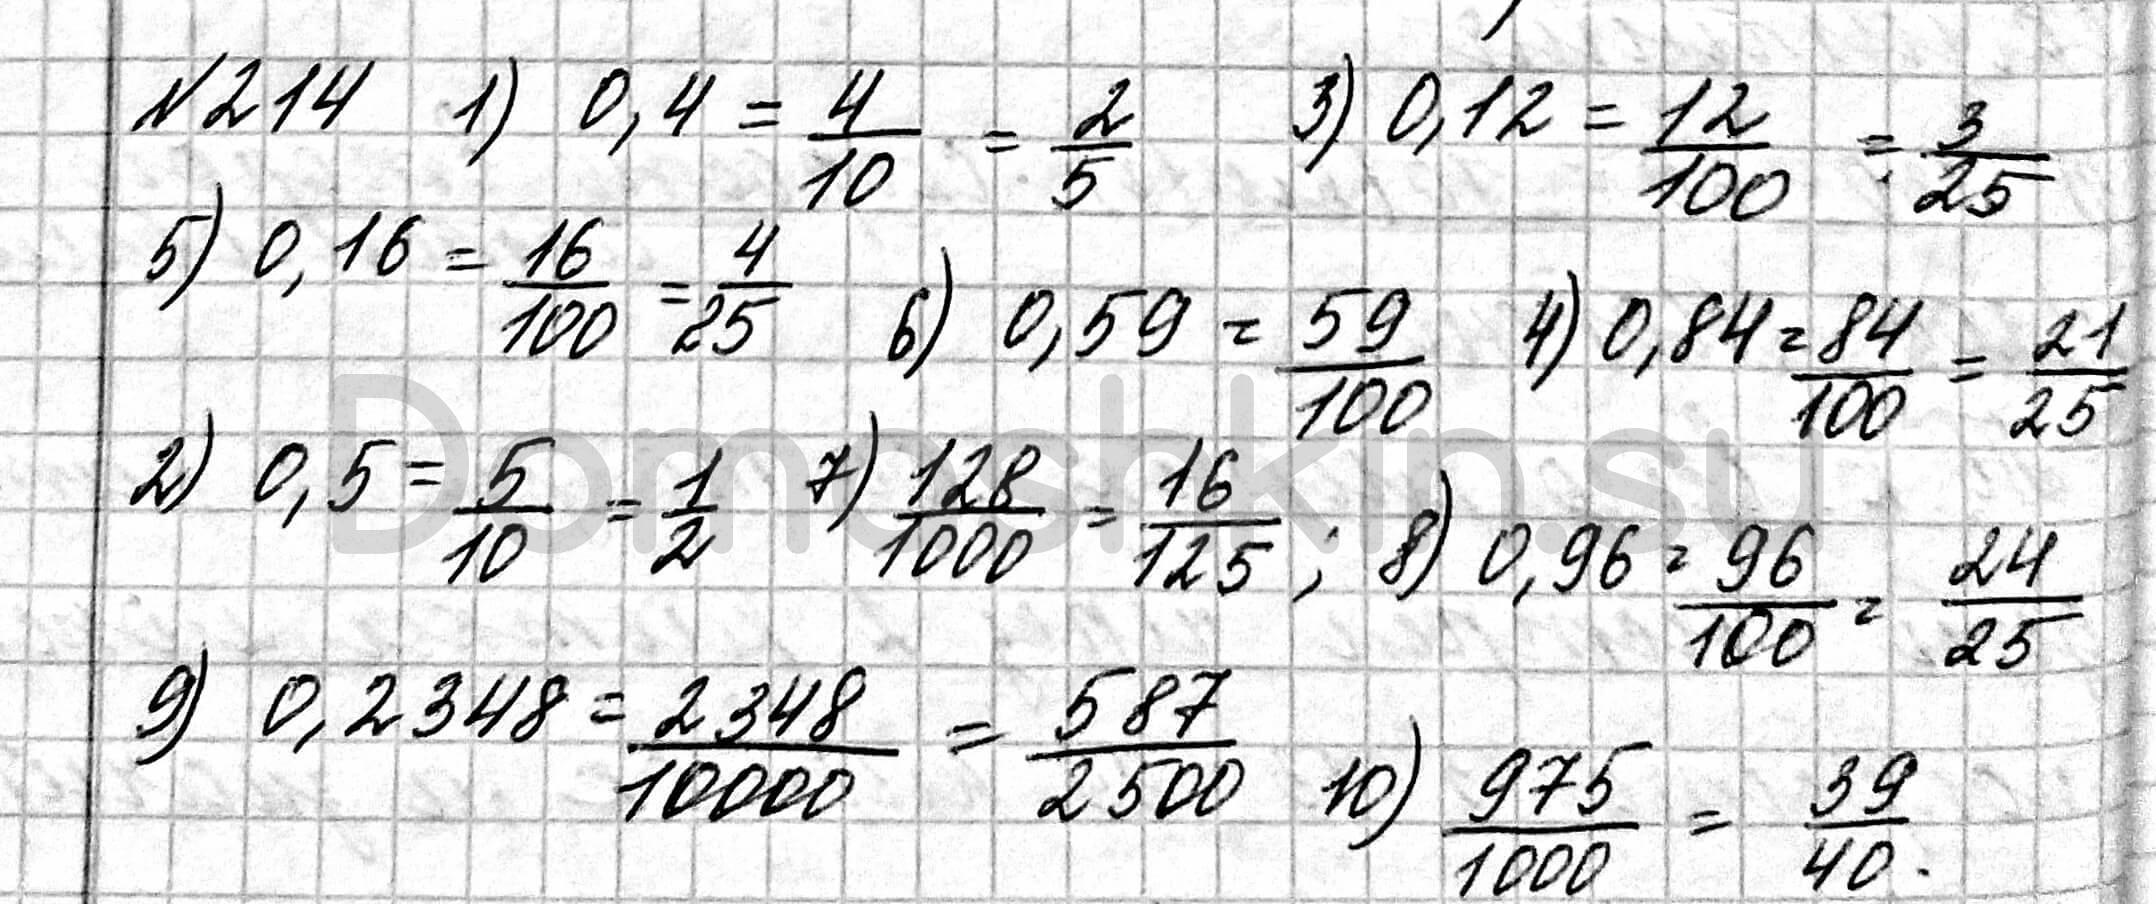 Математика 6 класс учебник Мерзляк номер 214 решение